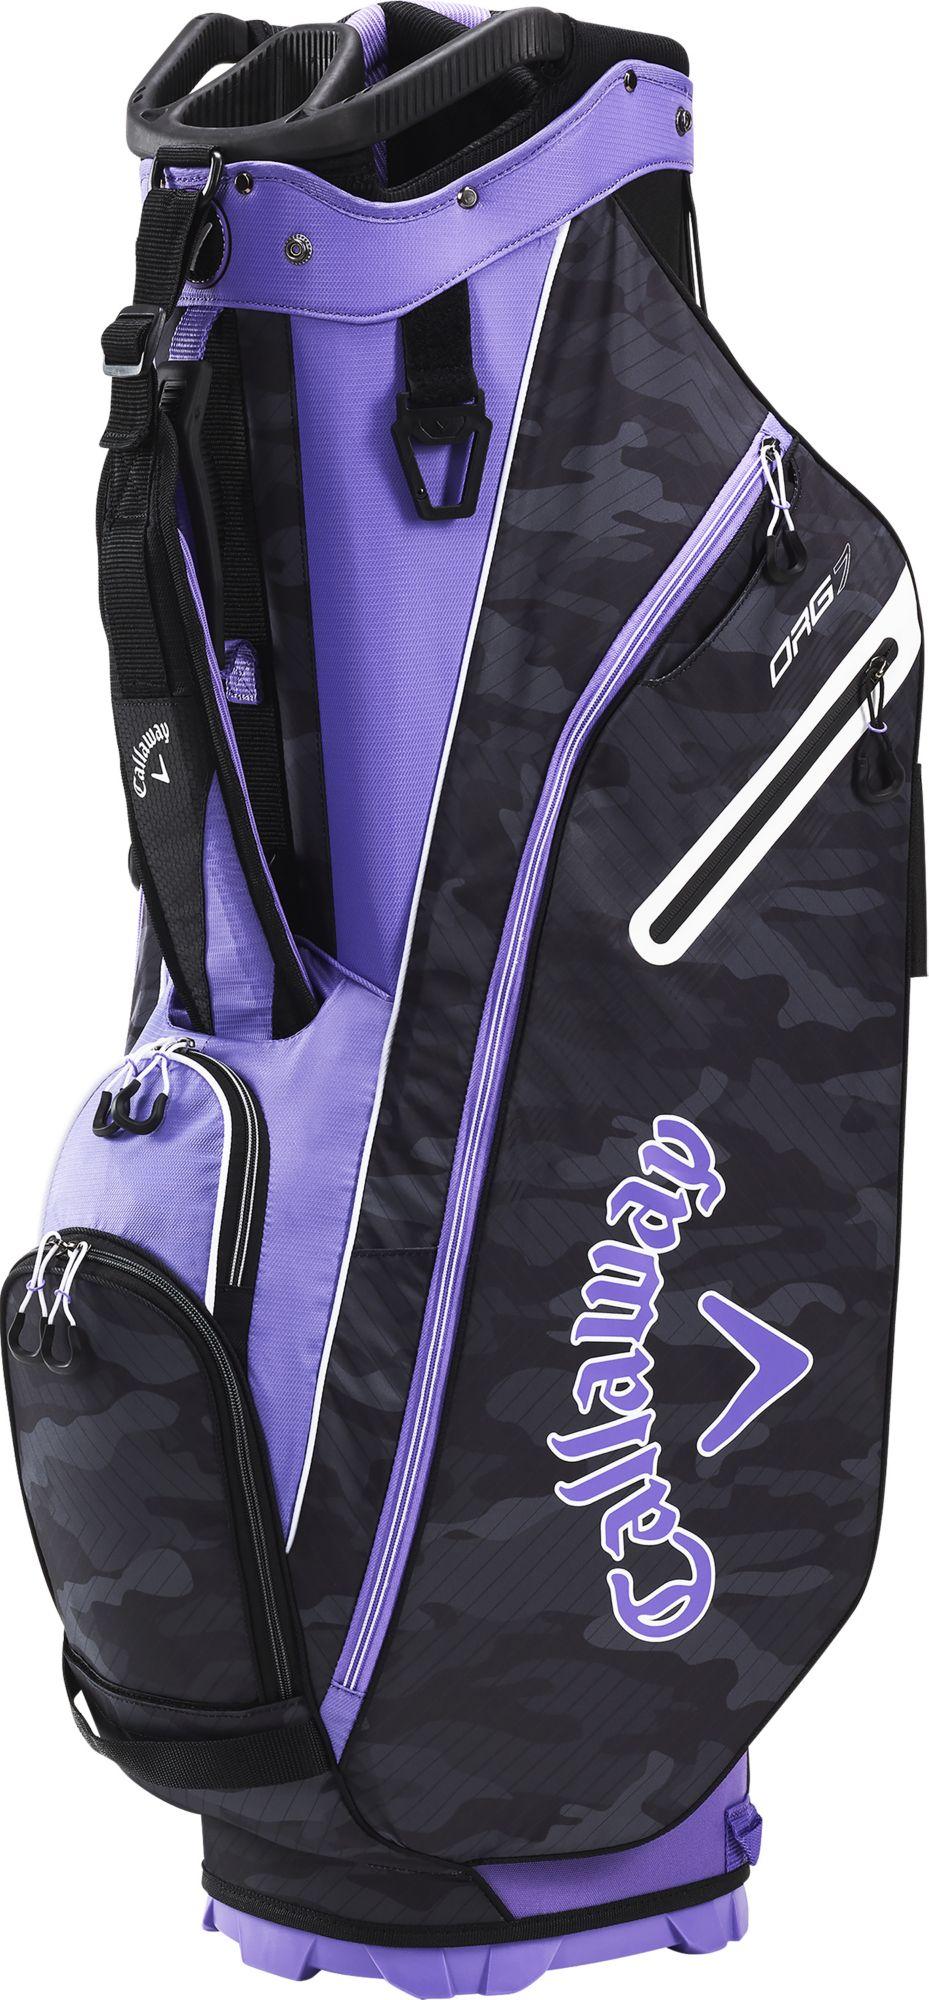 Callaway Women's 2020 Org 7 Cart Golf Bag, Lilac/Black Camo